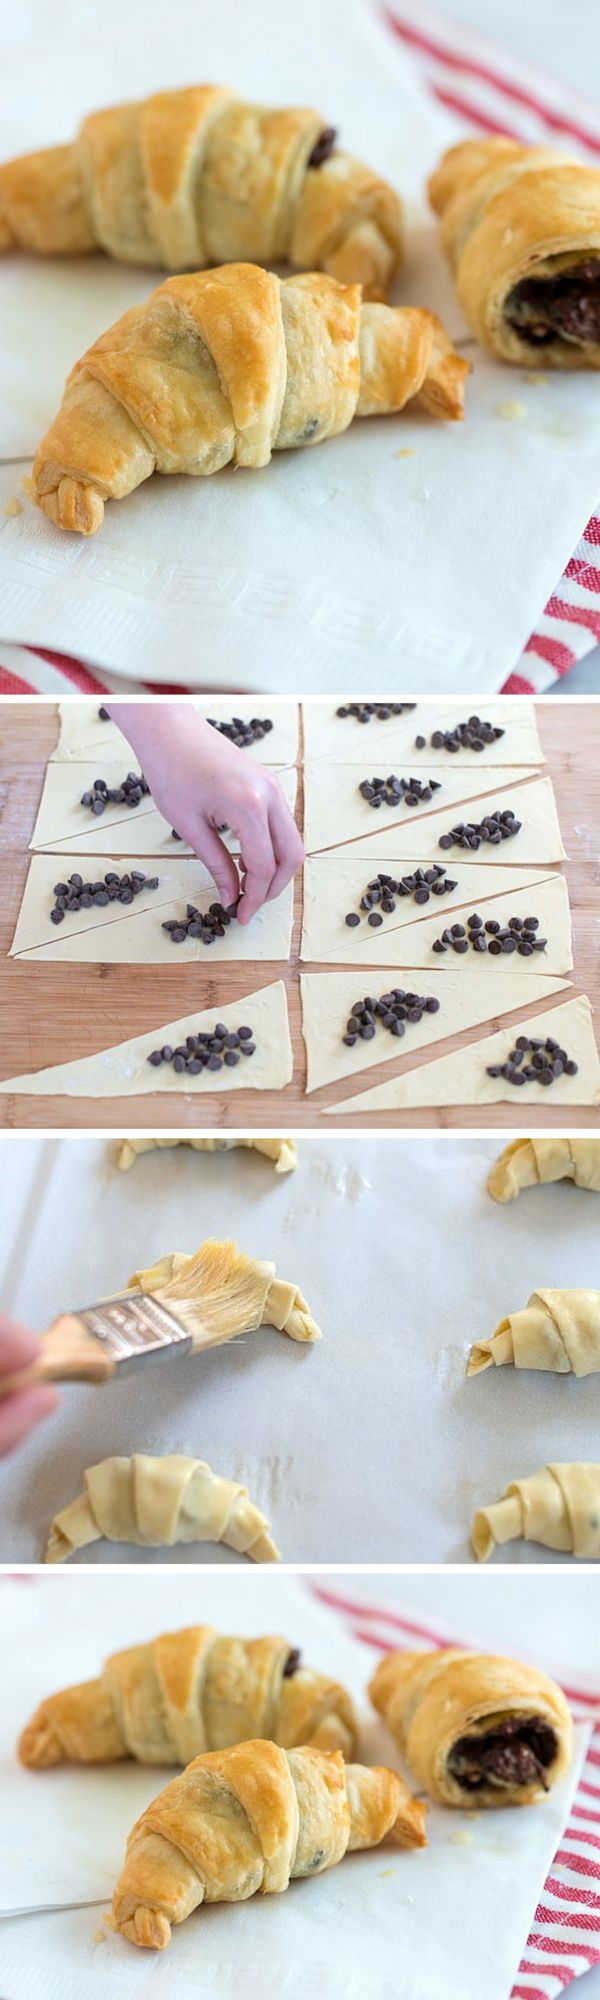 Mini Chocolate Croissants on inspiredtaste.net that only take 30 minutes to make!